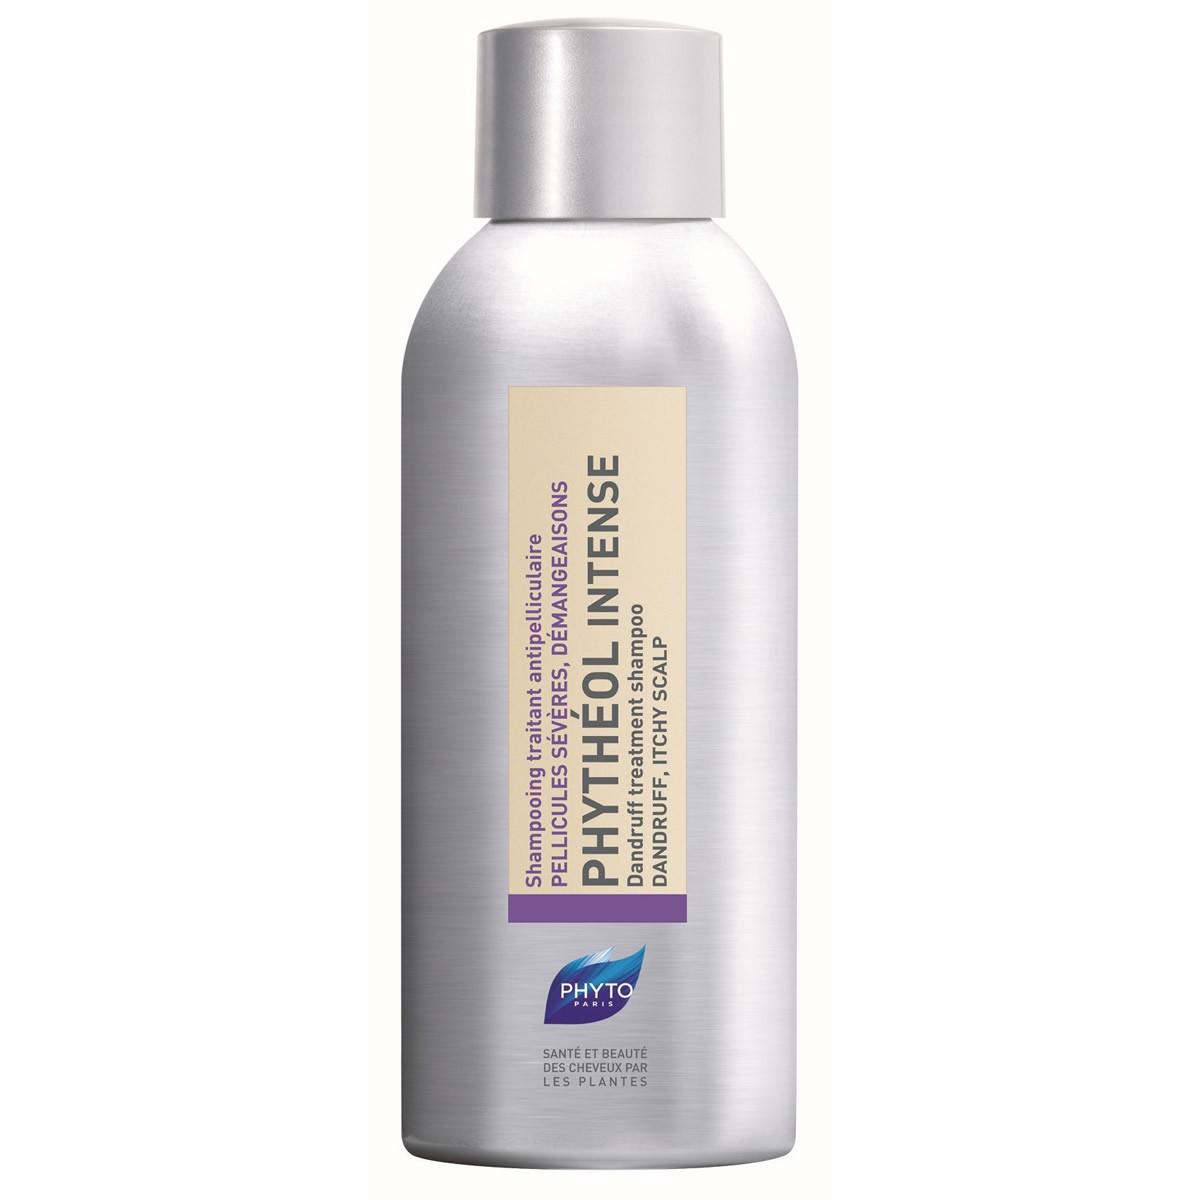 Phyto Phytheol Intense Anti-Dandruff Treatment Shampoo